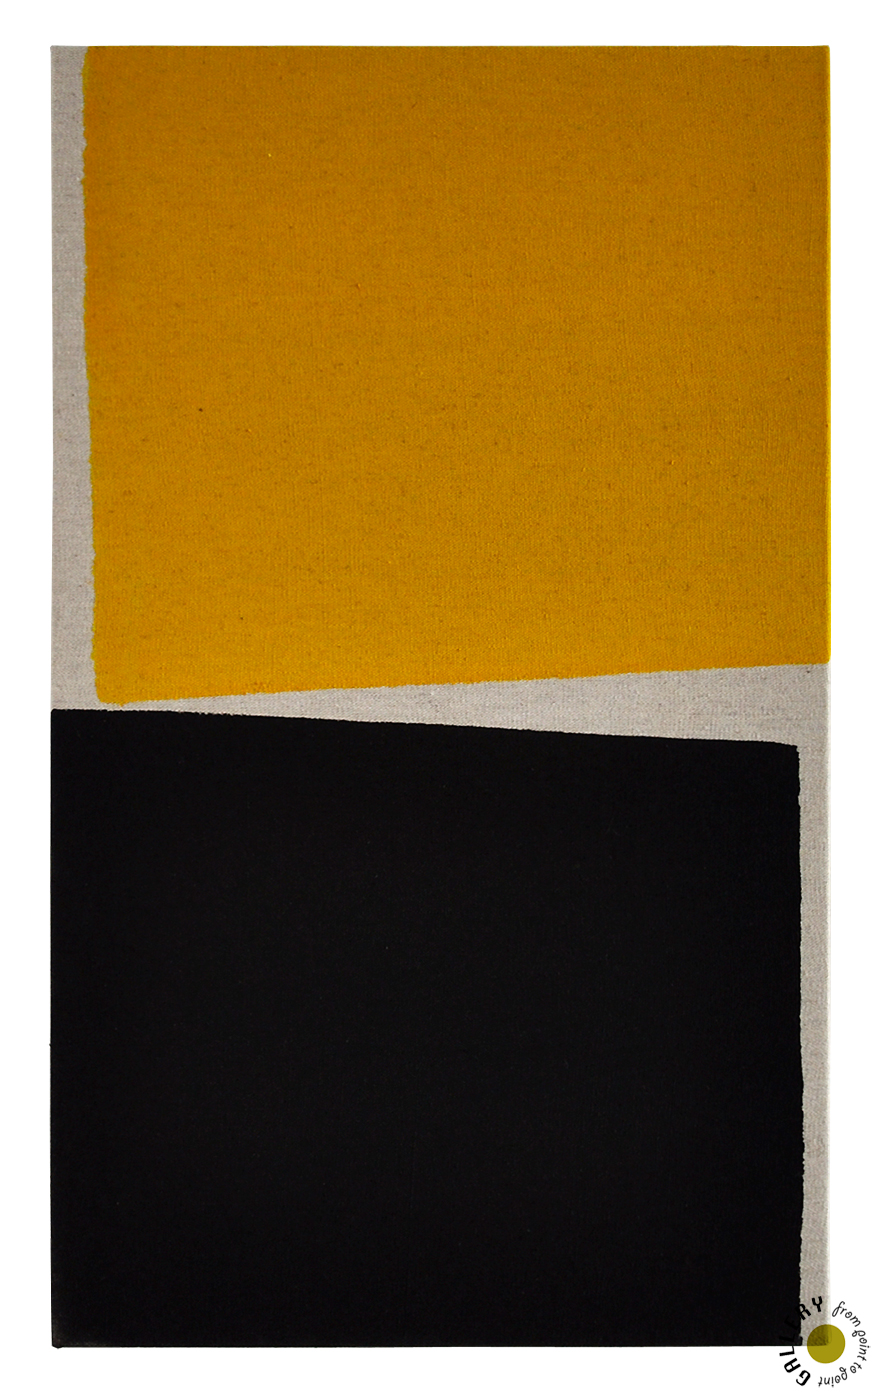 Guillaume-Moschini-Peinture-Jaune-Noir